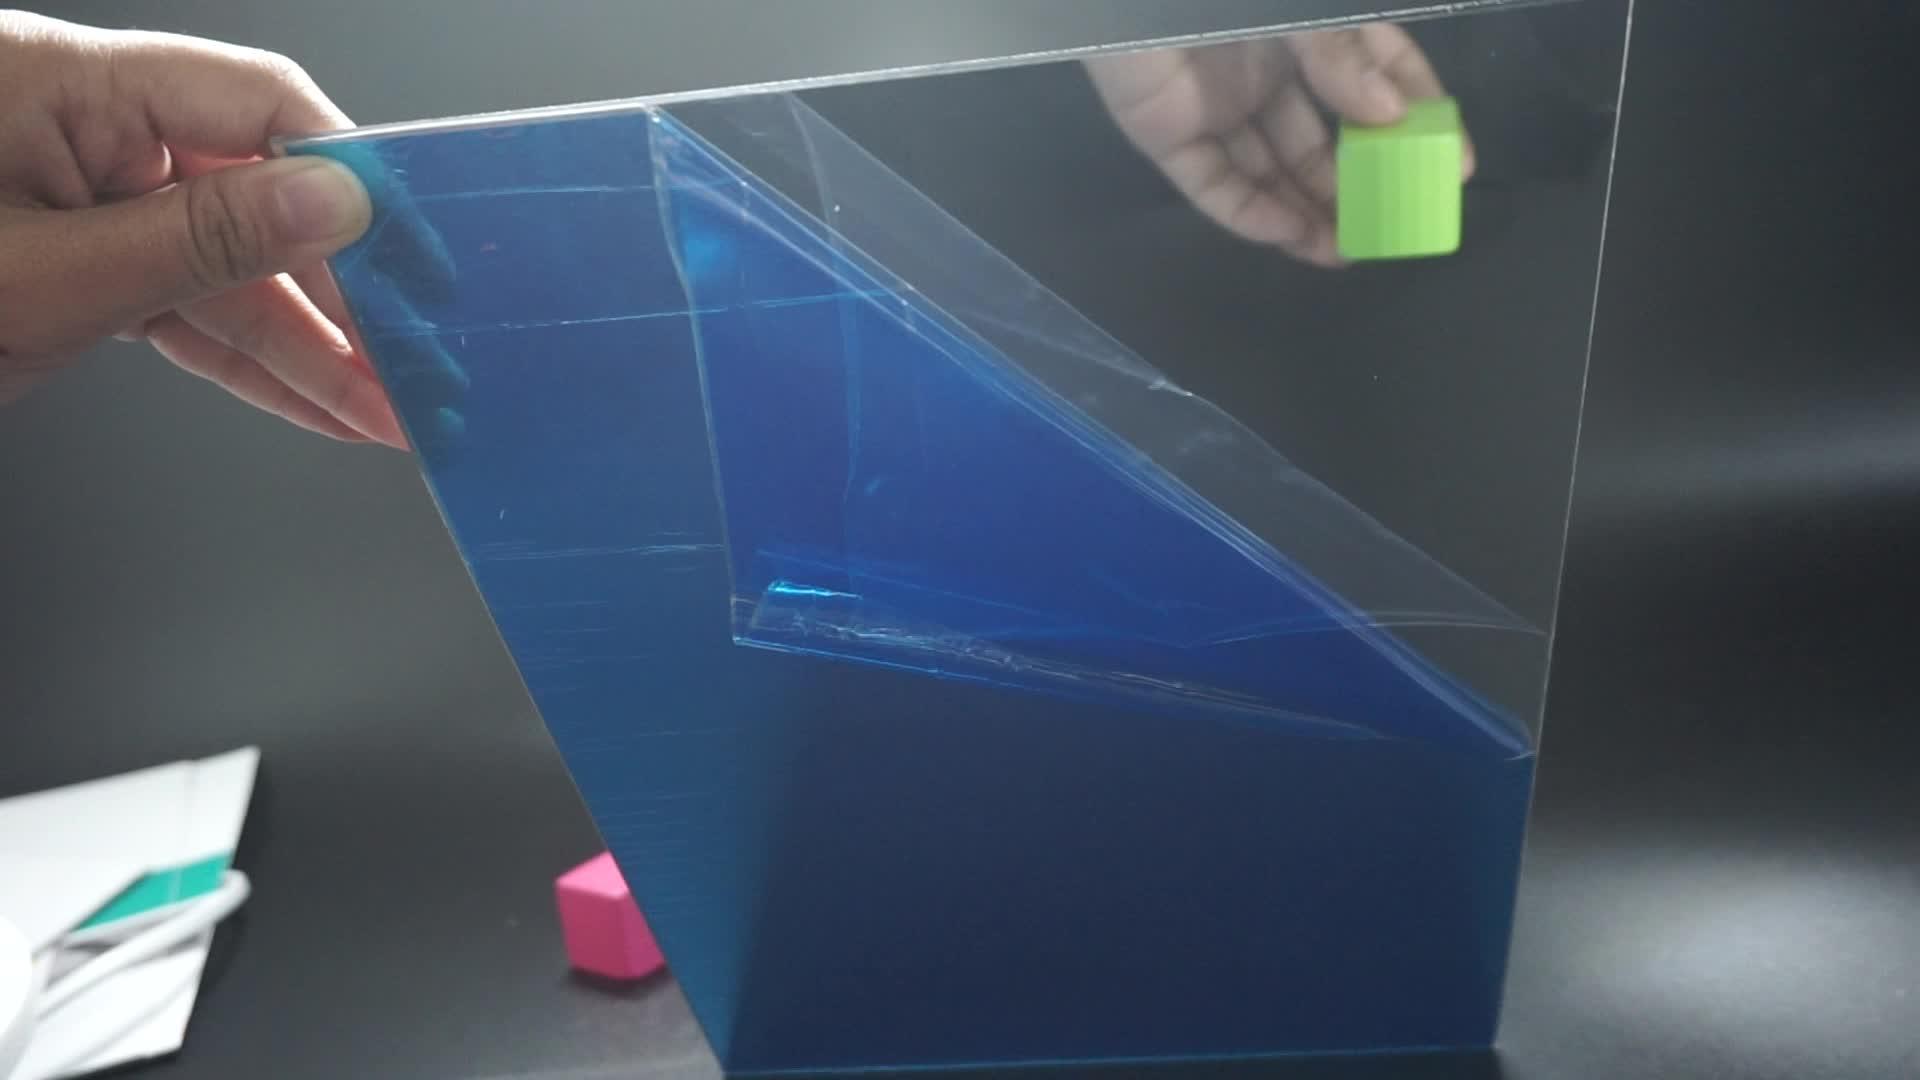 Saydam akrilik panel ayna akrilik levha ucuz fiyat